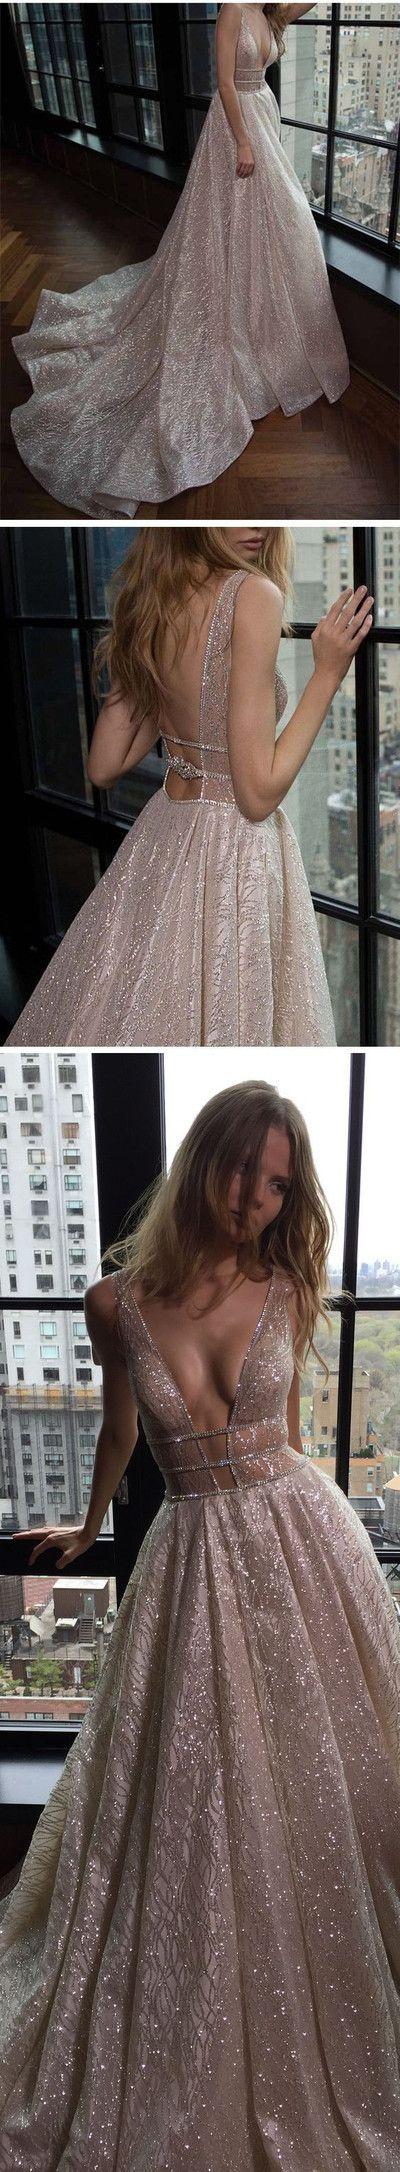 prom dresses, 2017 sparkling prom dresses, backless prom party dresses, grey party dresses with beading train,254